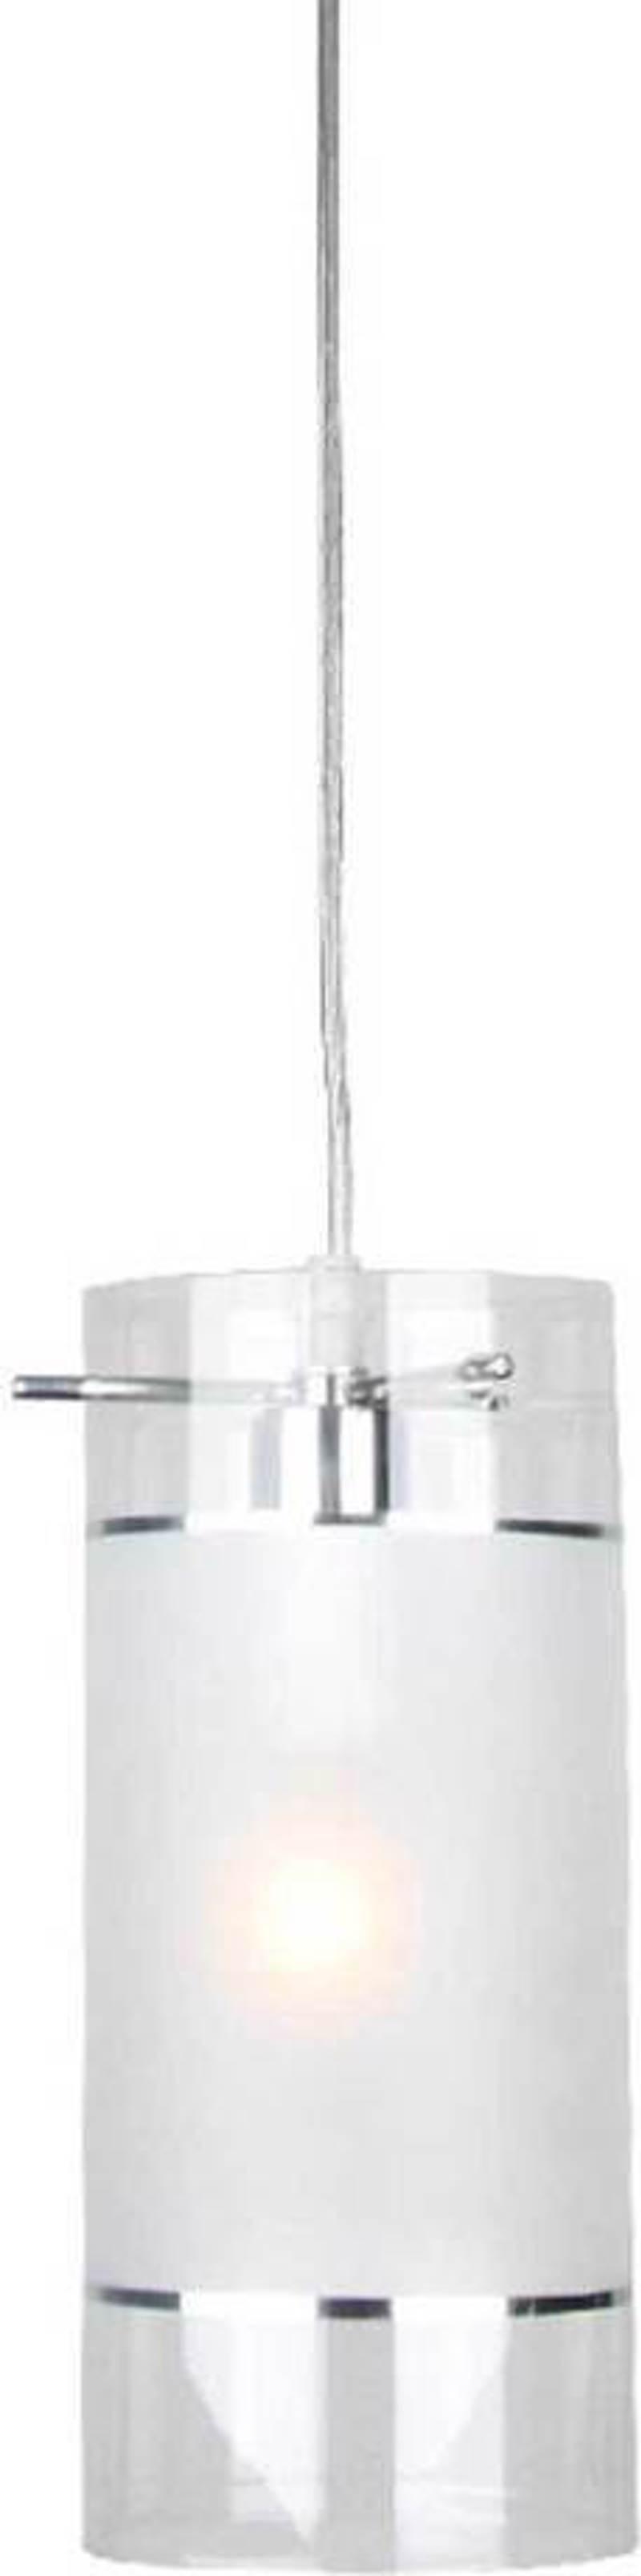 ACA Φωτιστικό Οροφής Μεταλλικό/Γυάλινο 'Mane' Χρώμιο/Διάφανο Ε14 13Χ22cm FW50671